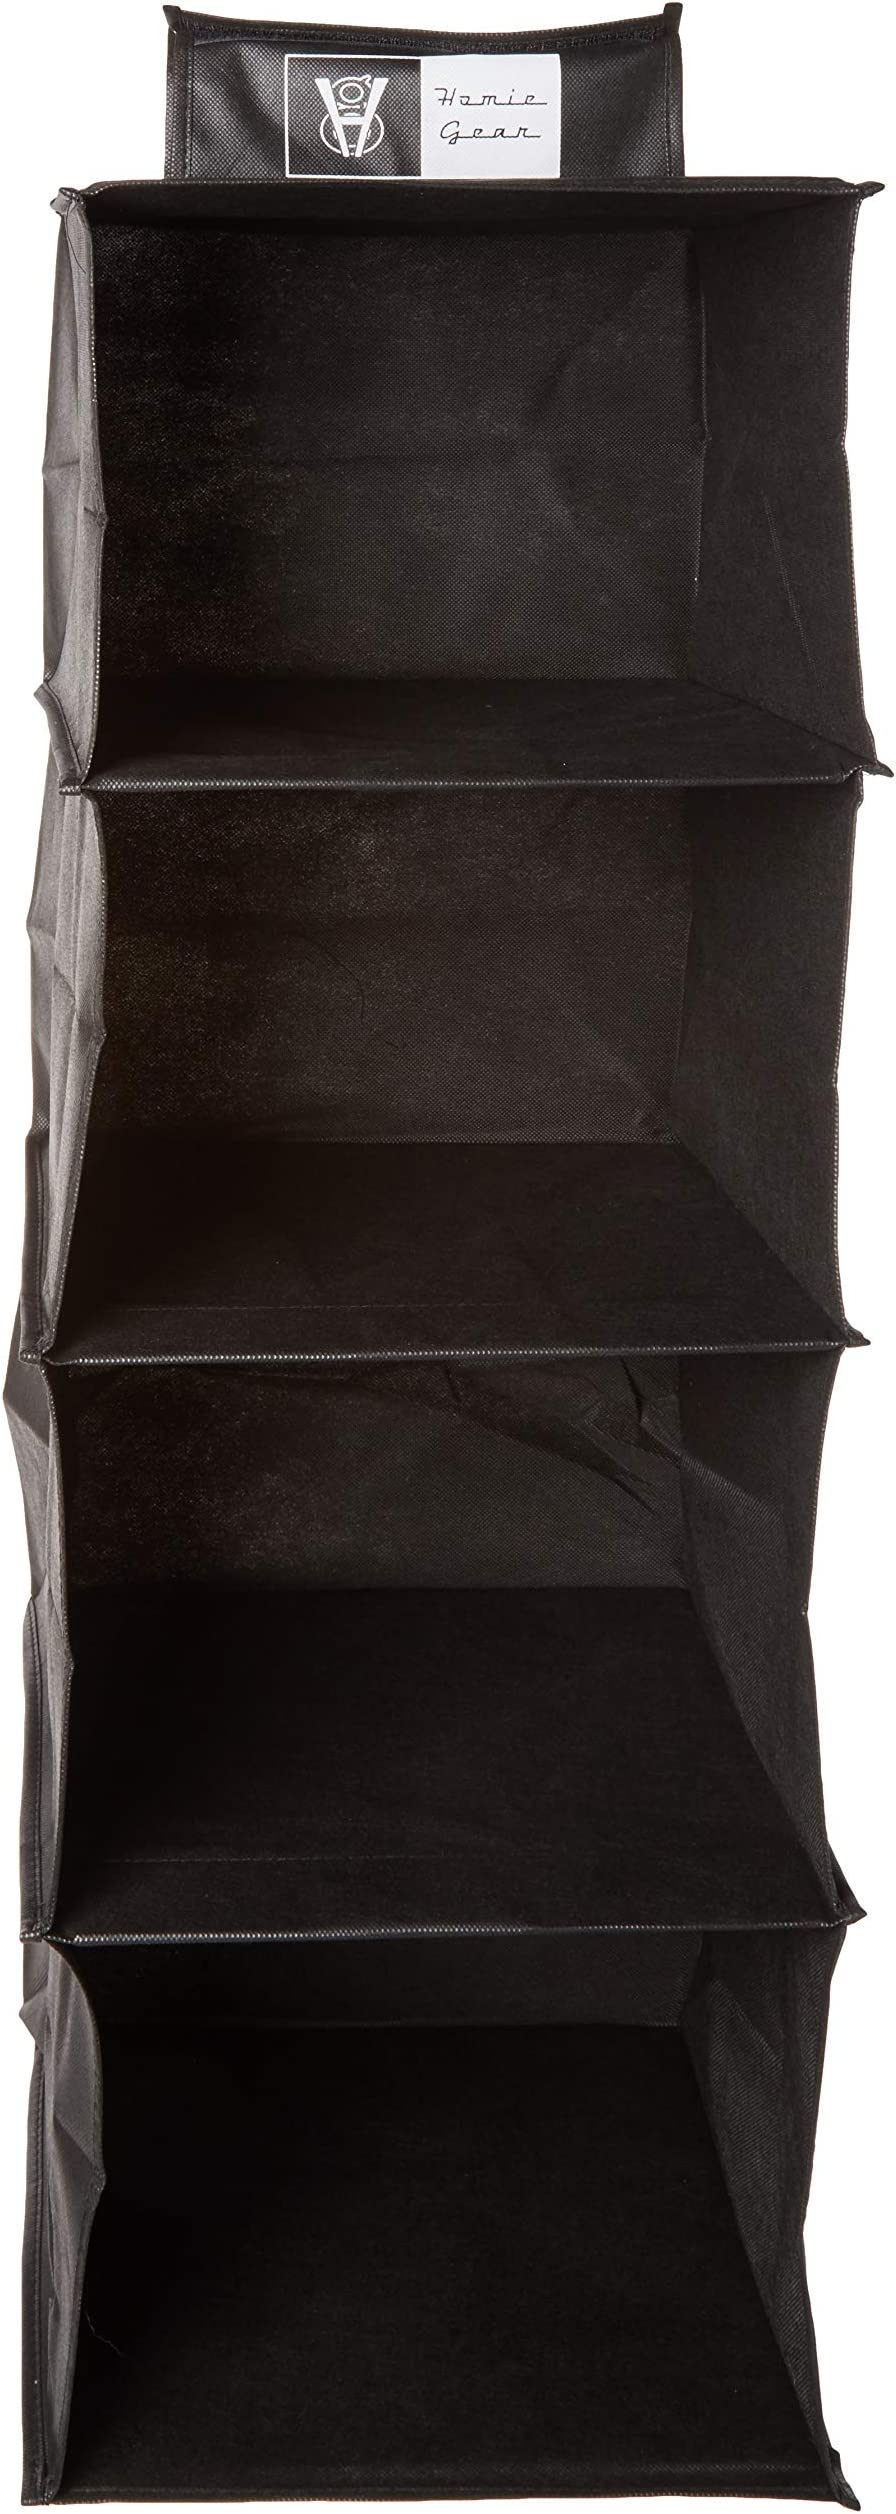 Caps Hat Bag Hanger Hat Storage Rack System Cap Holder Closet Han M5C9